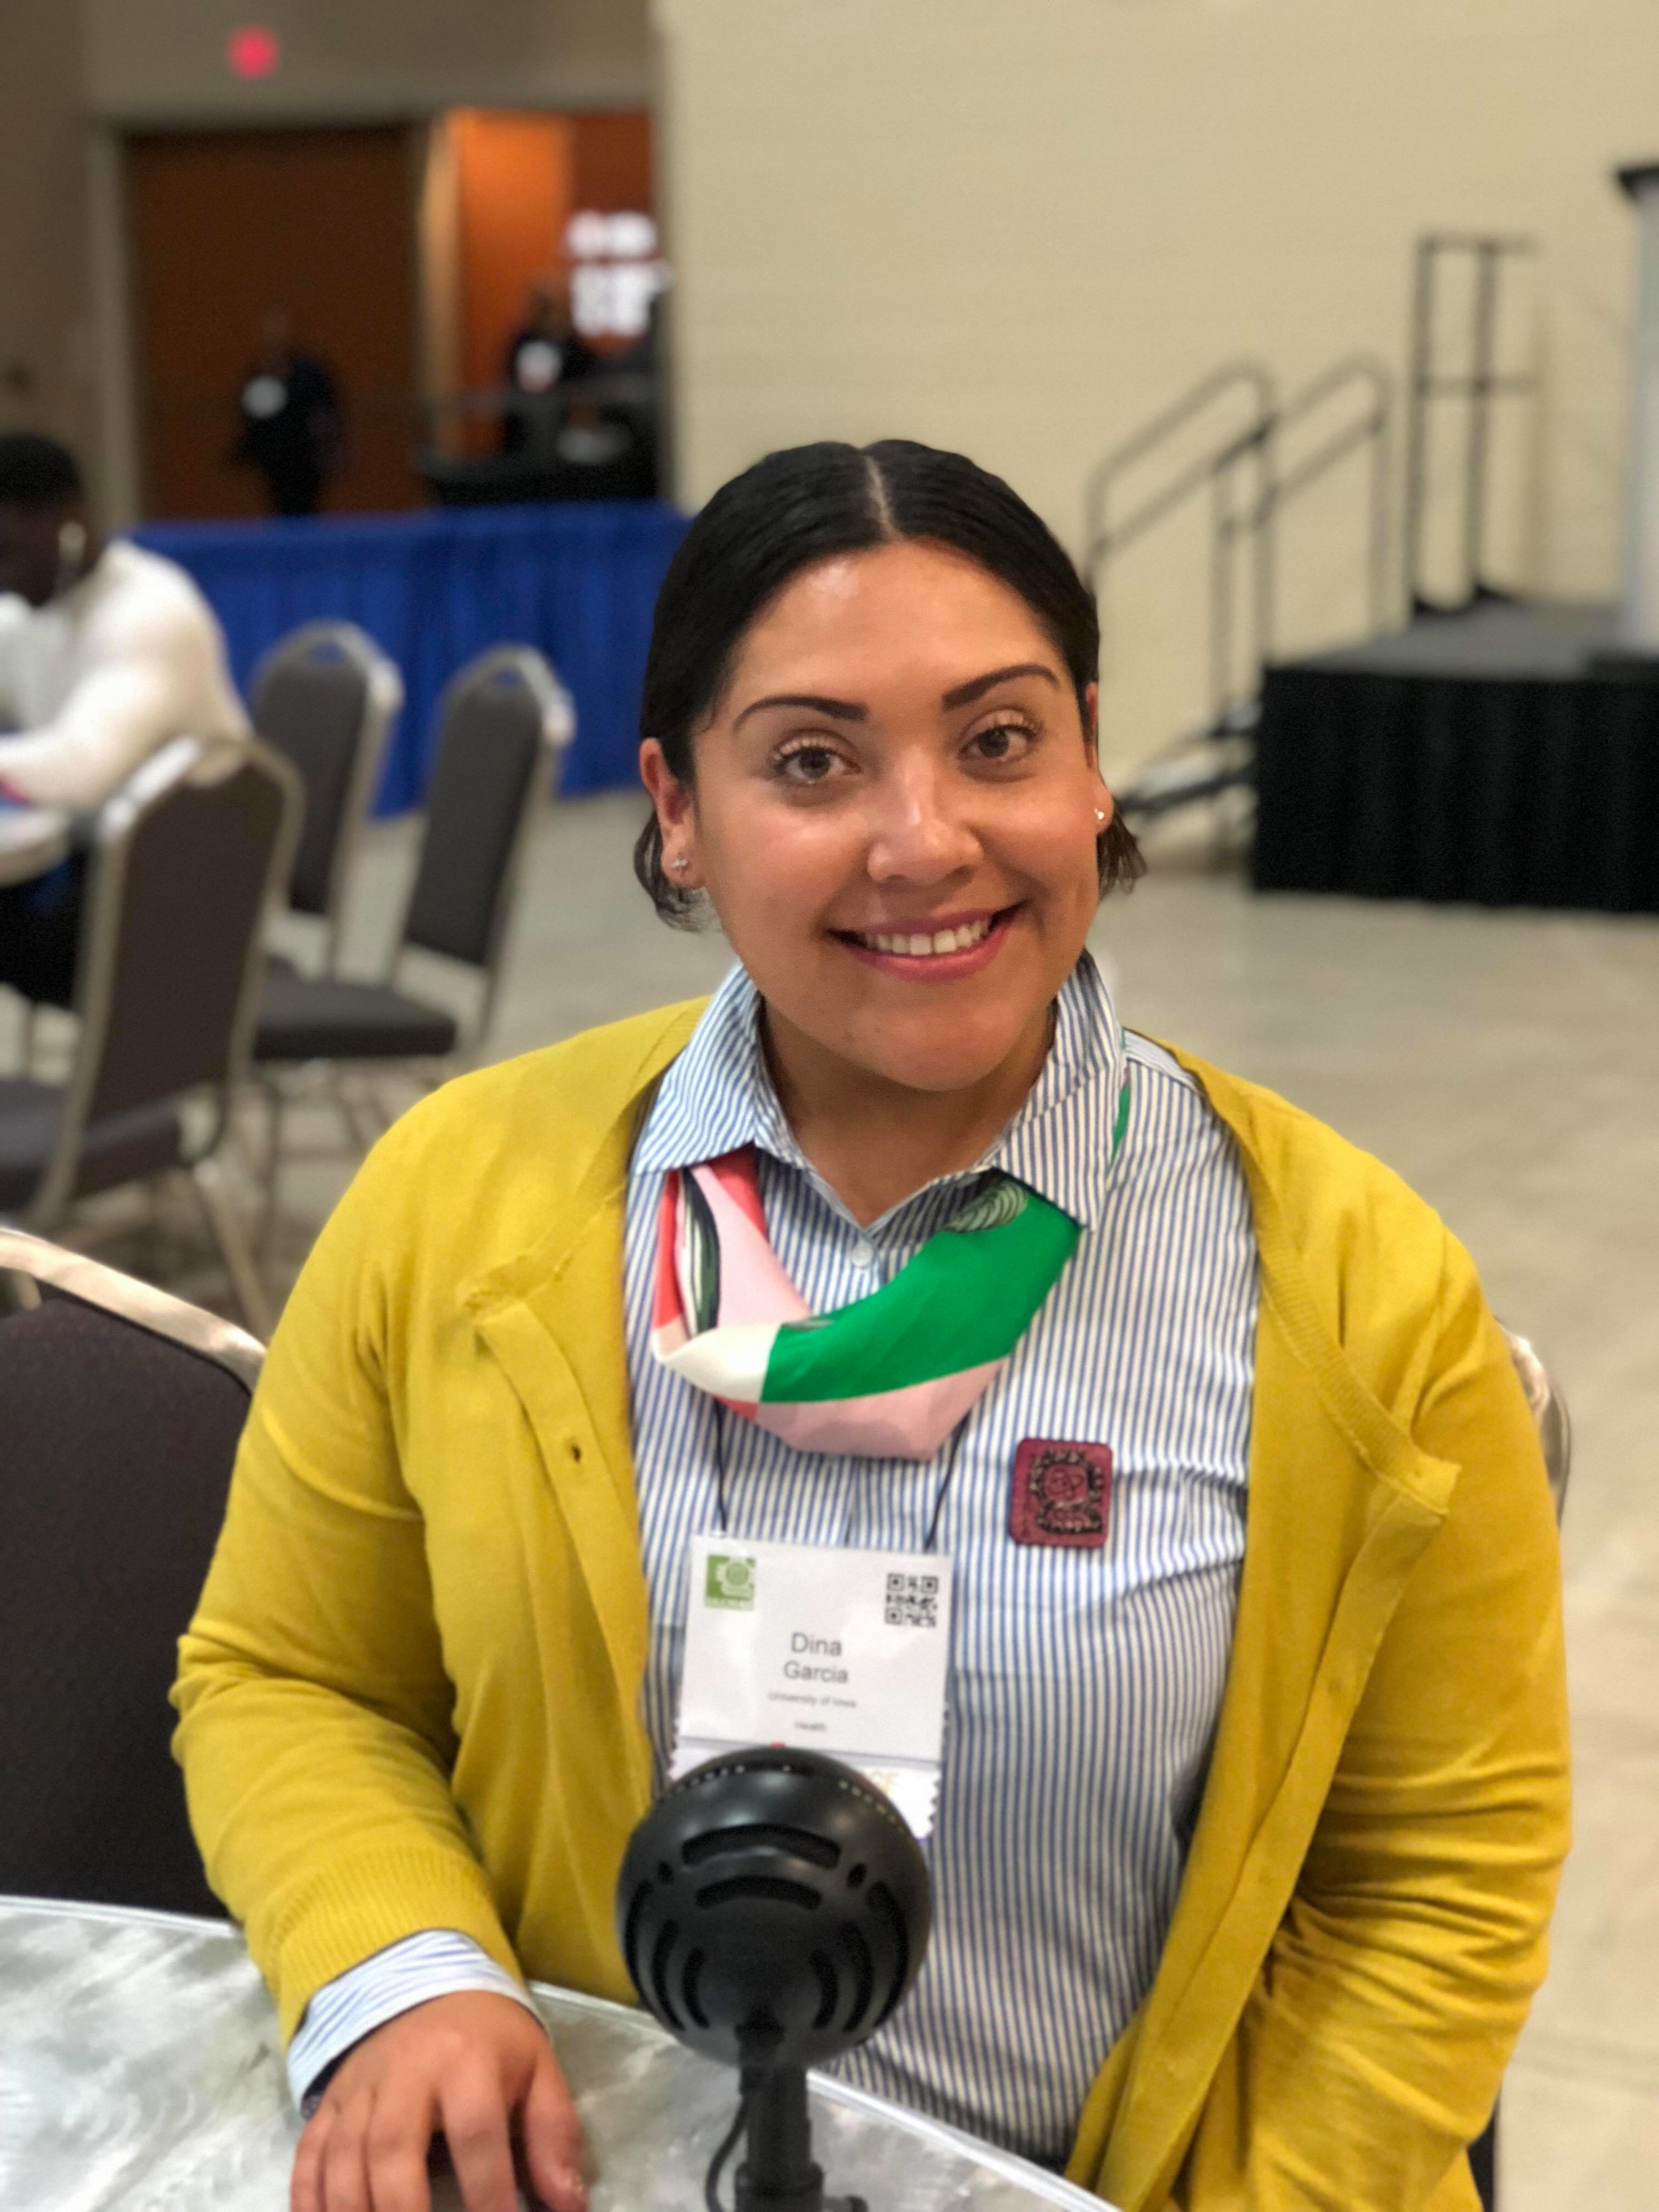 Dina García, PhD  - Assistant Professor, Department of Health Behavior and Policy at Virginia Commonwealth University School of Medicine